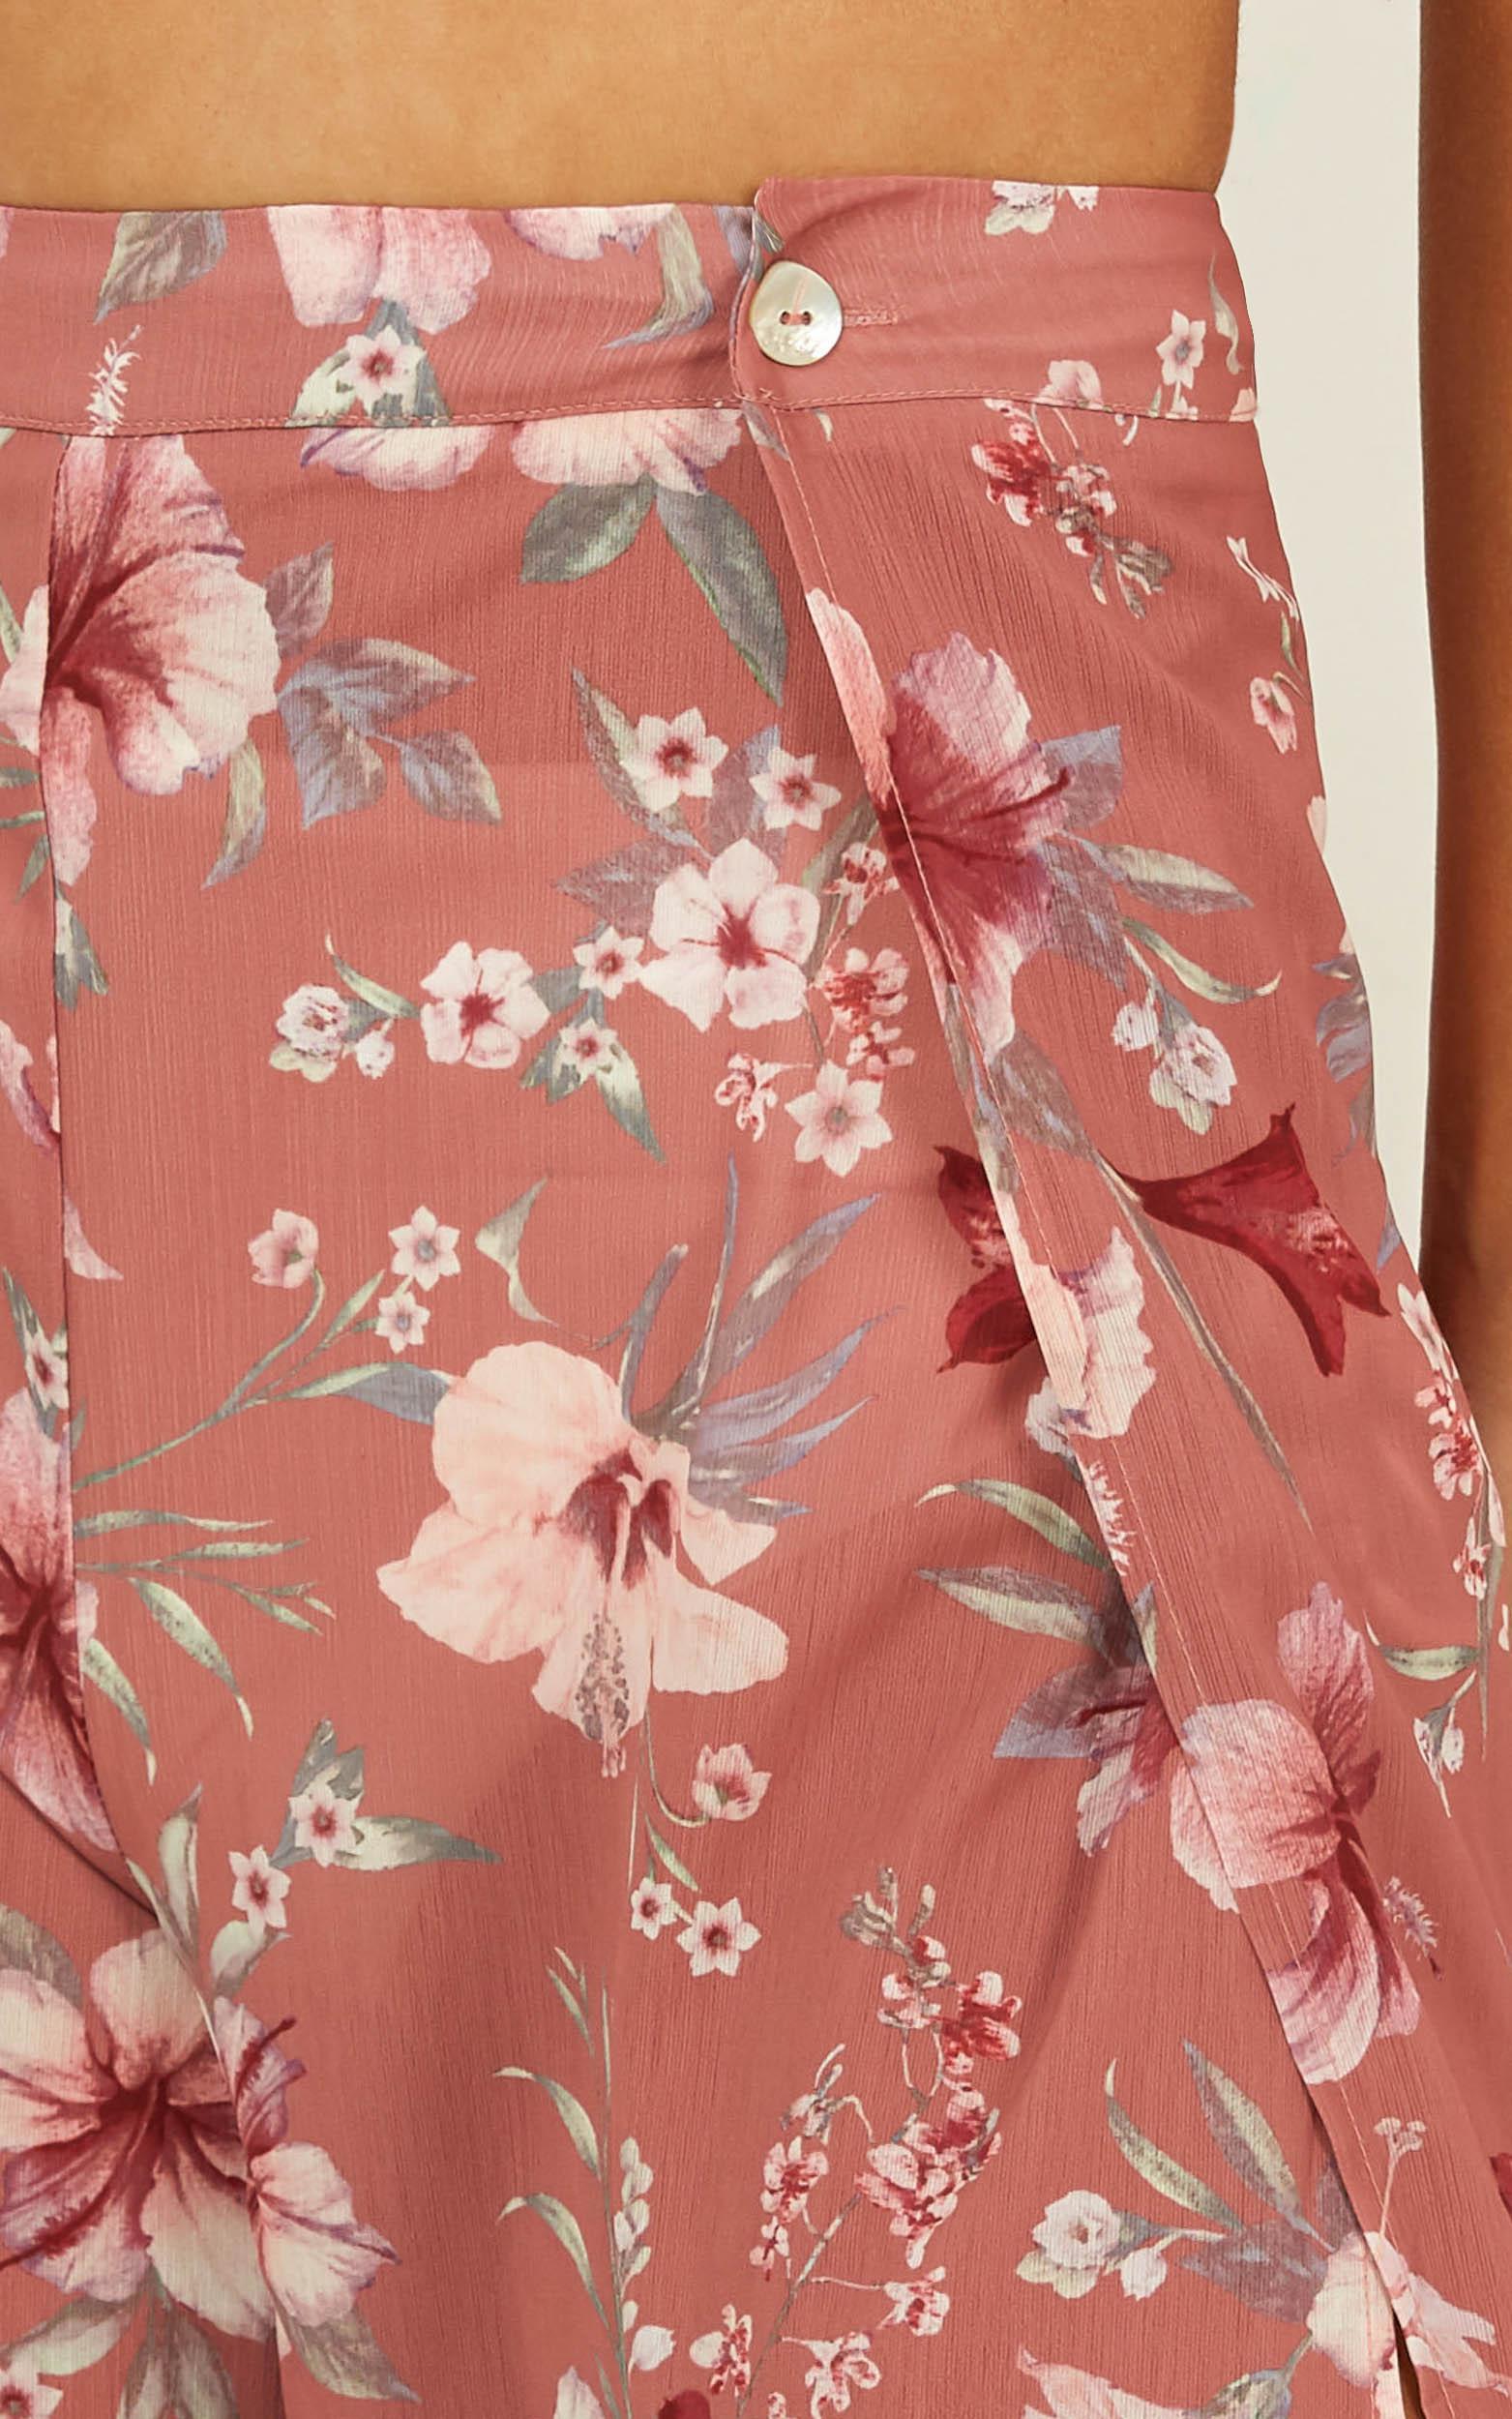 never skip a beat pants in rose floral - 12 (L), Blush, hi-res image number null